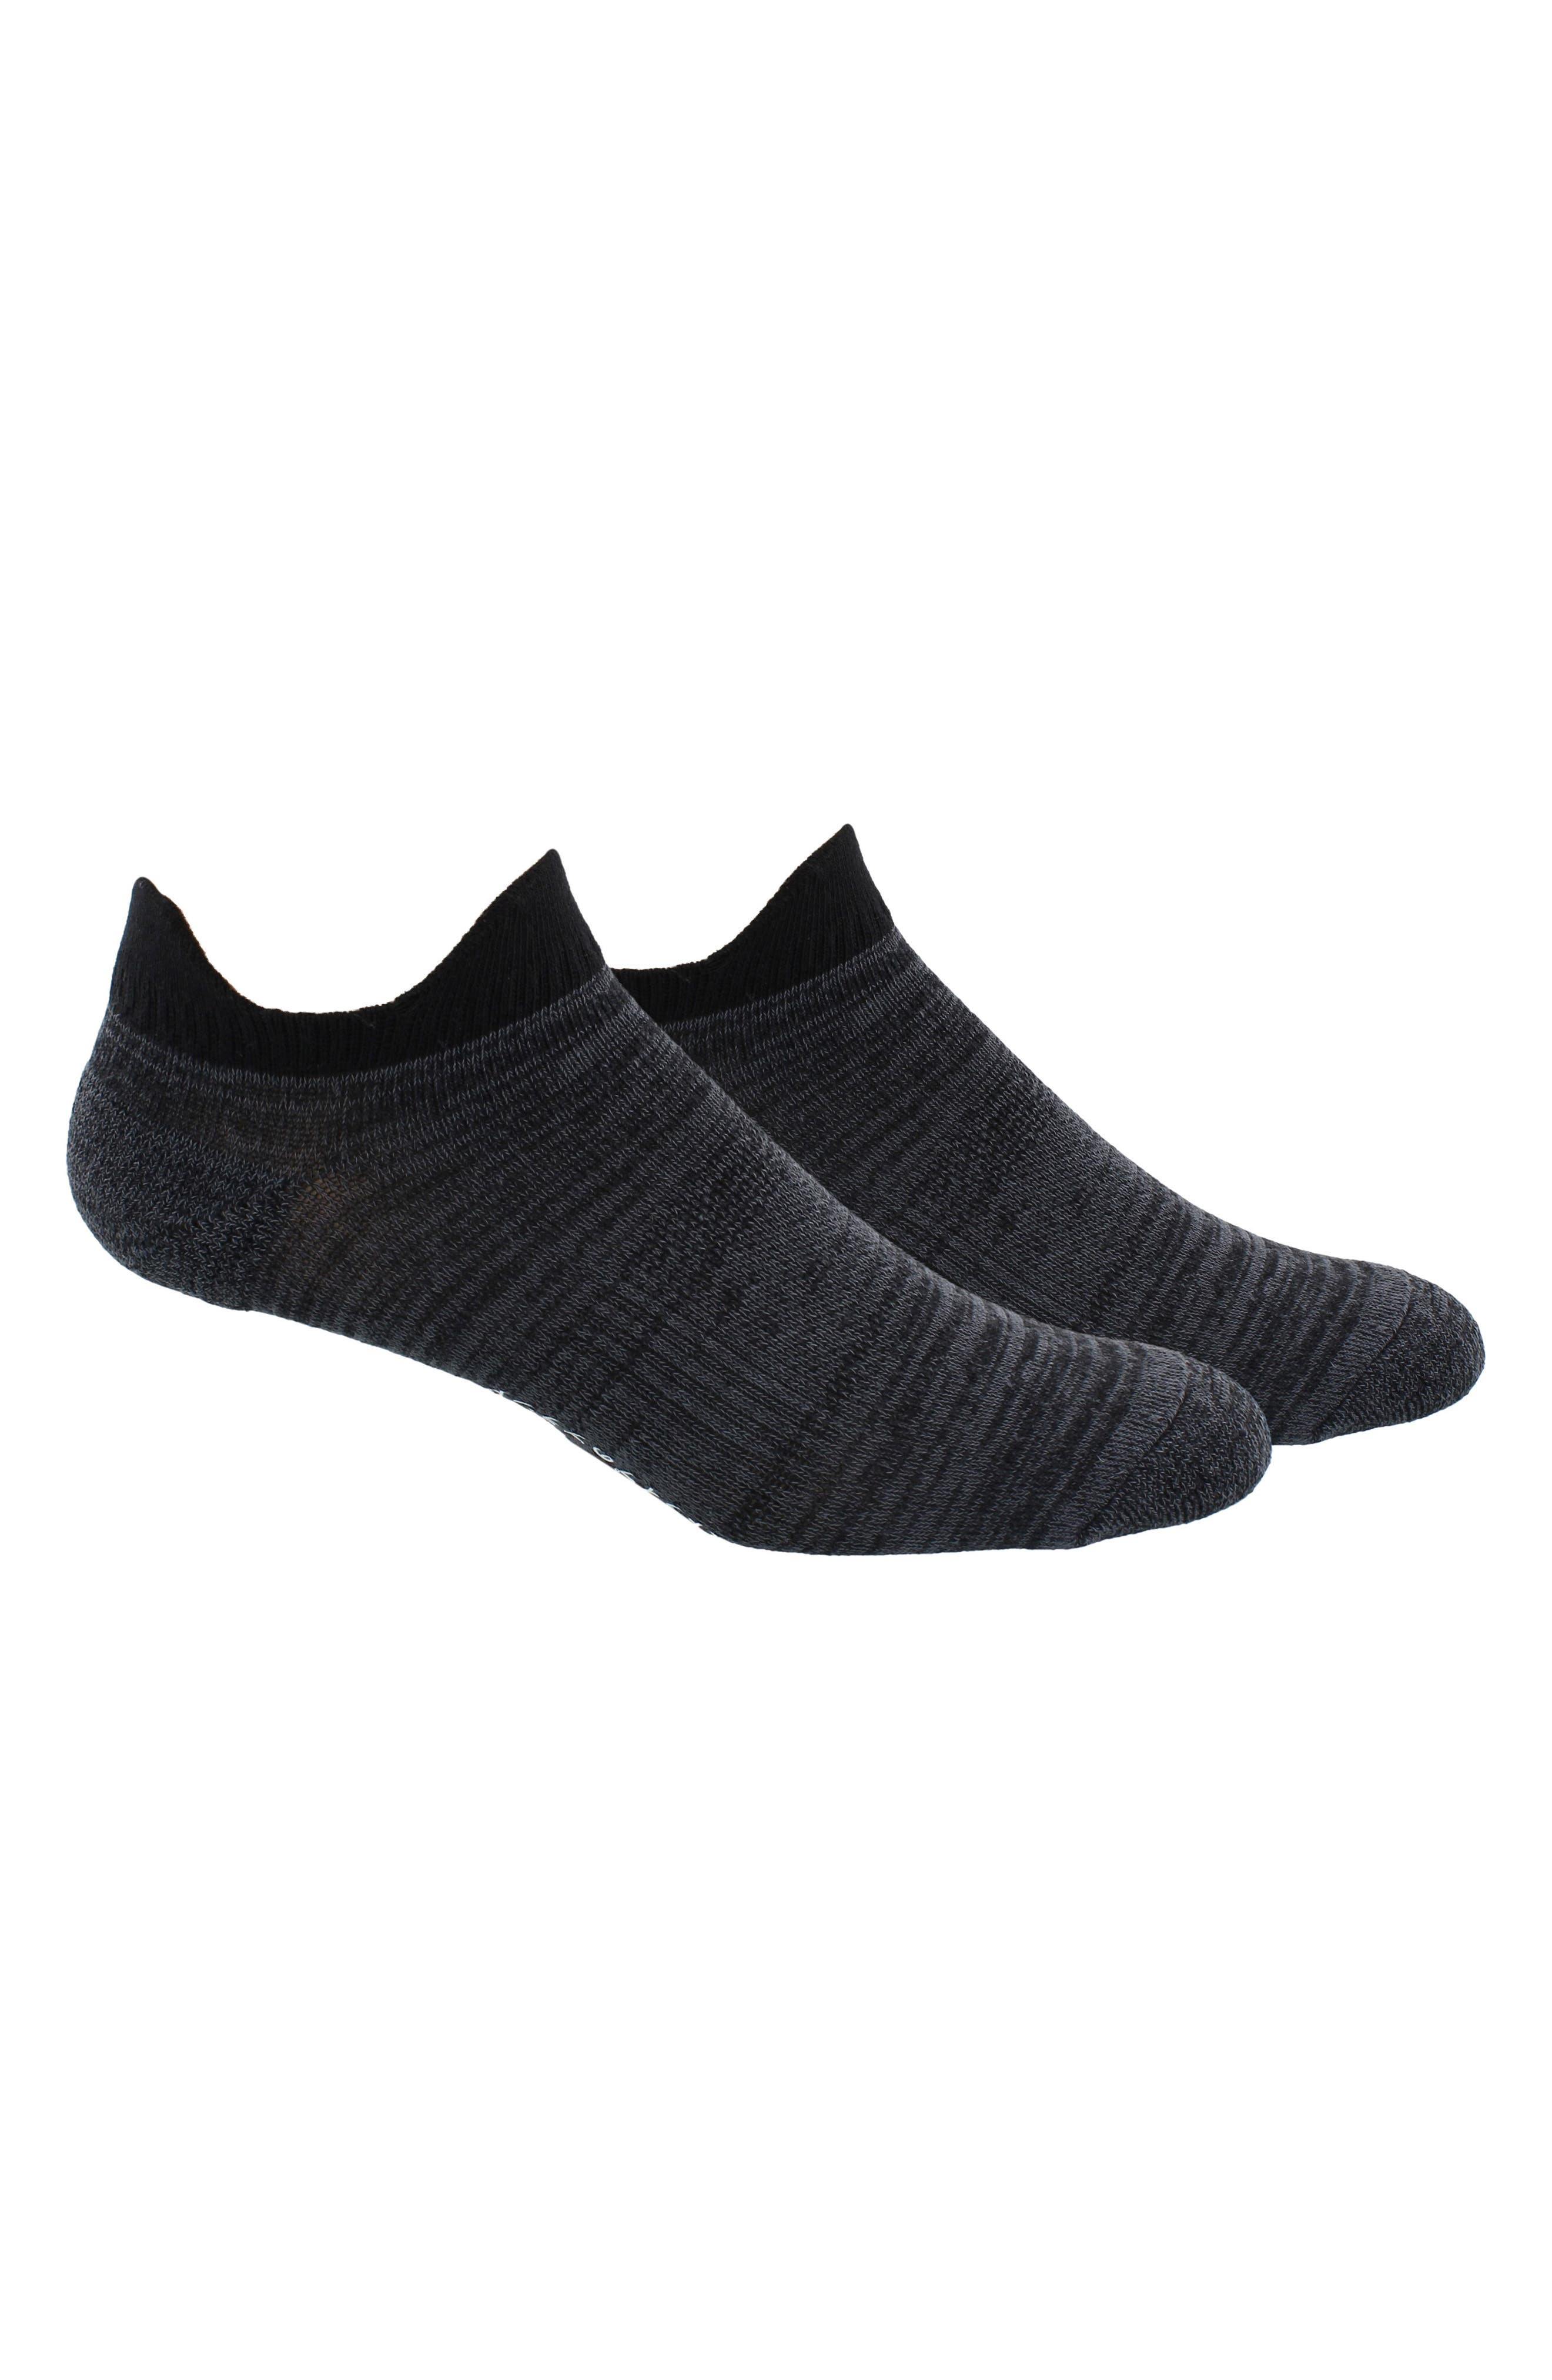 Original NMD Footie Socks,                             Alternate thumbnail 3, color,                             Black